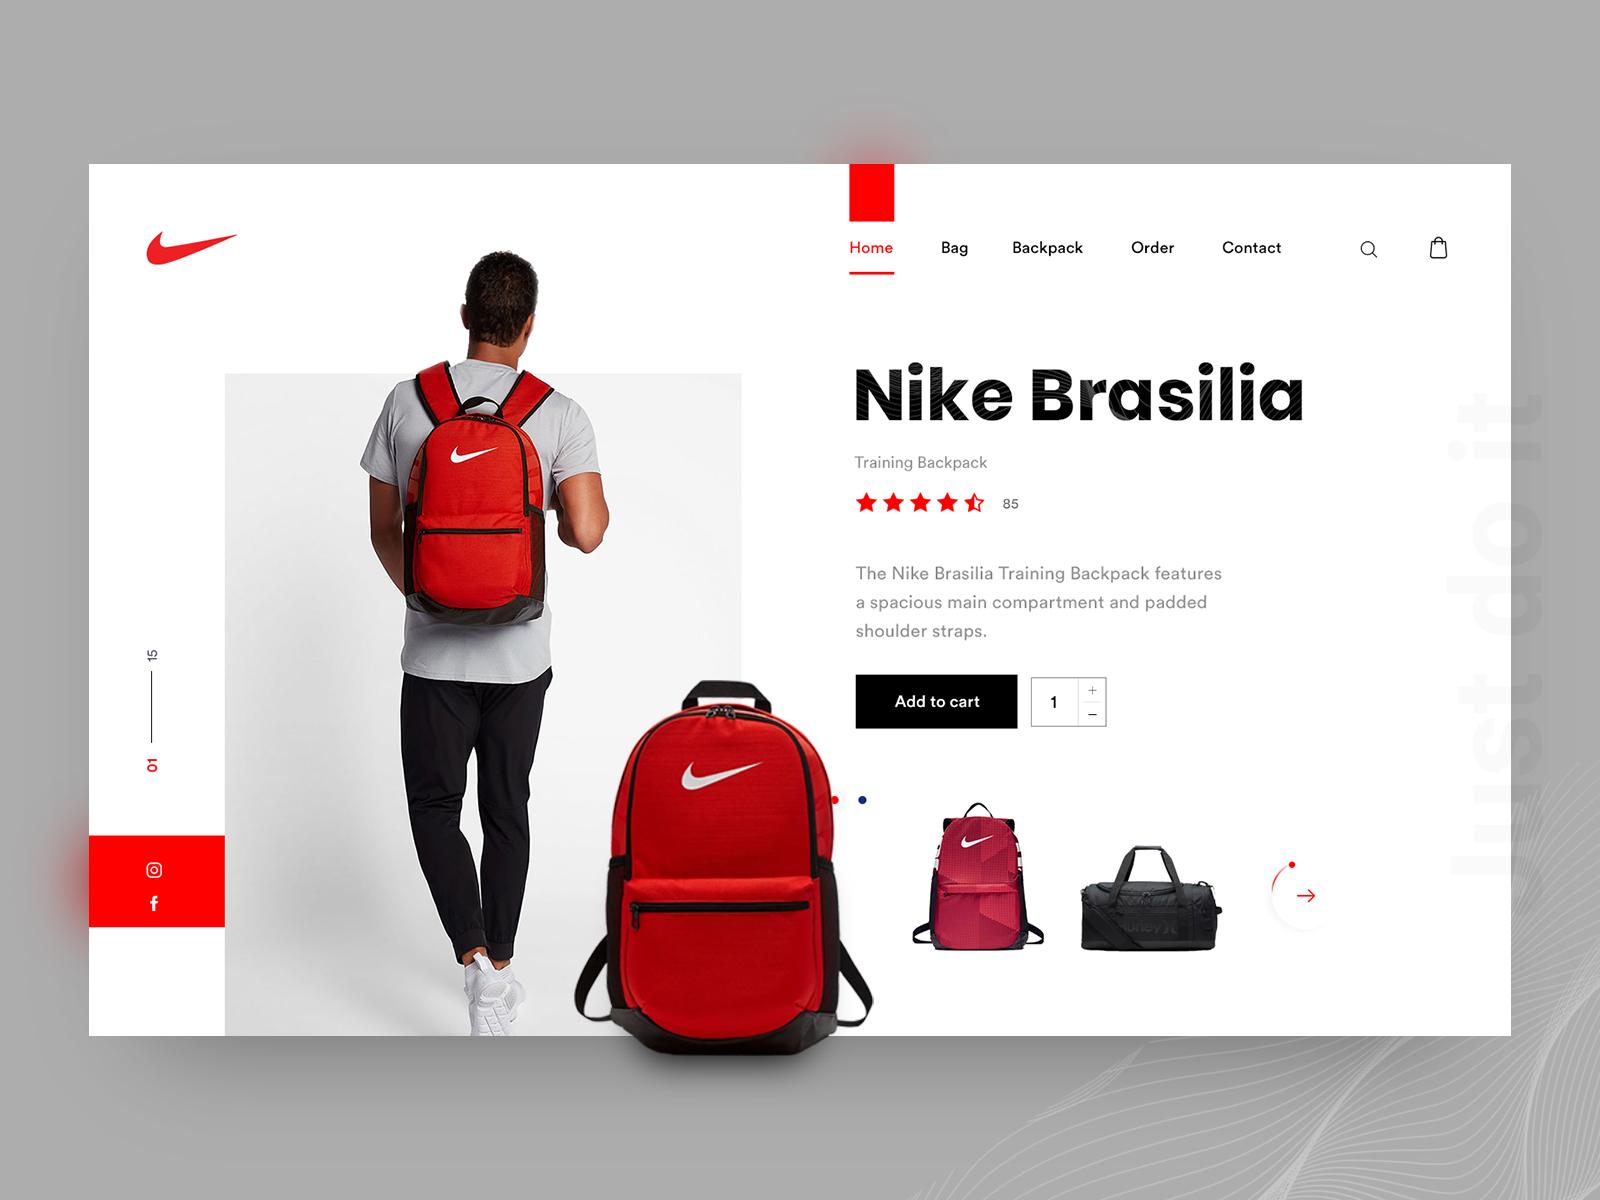 Nike Bag Backpack Header Exploration By Arafat Ahmed